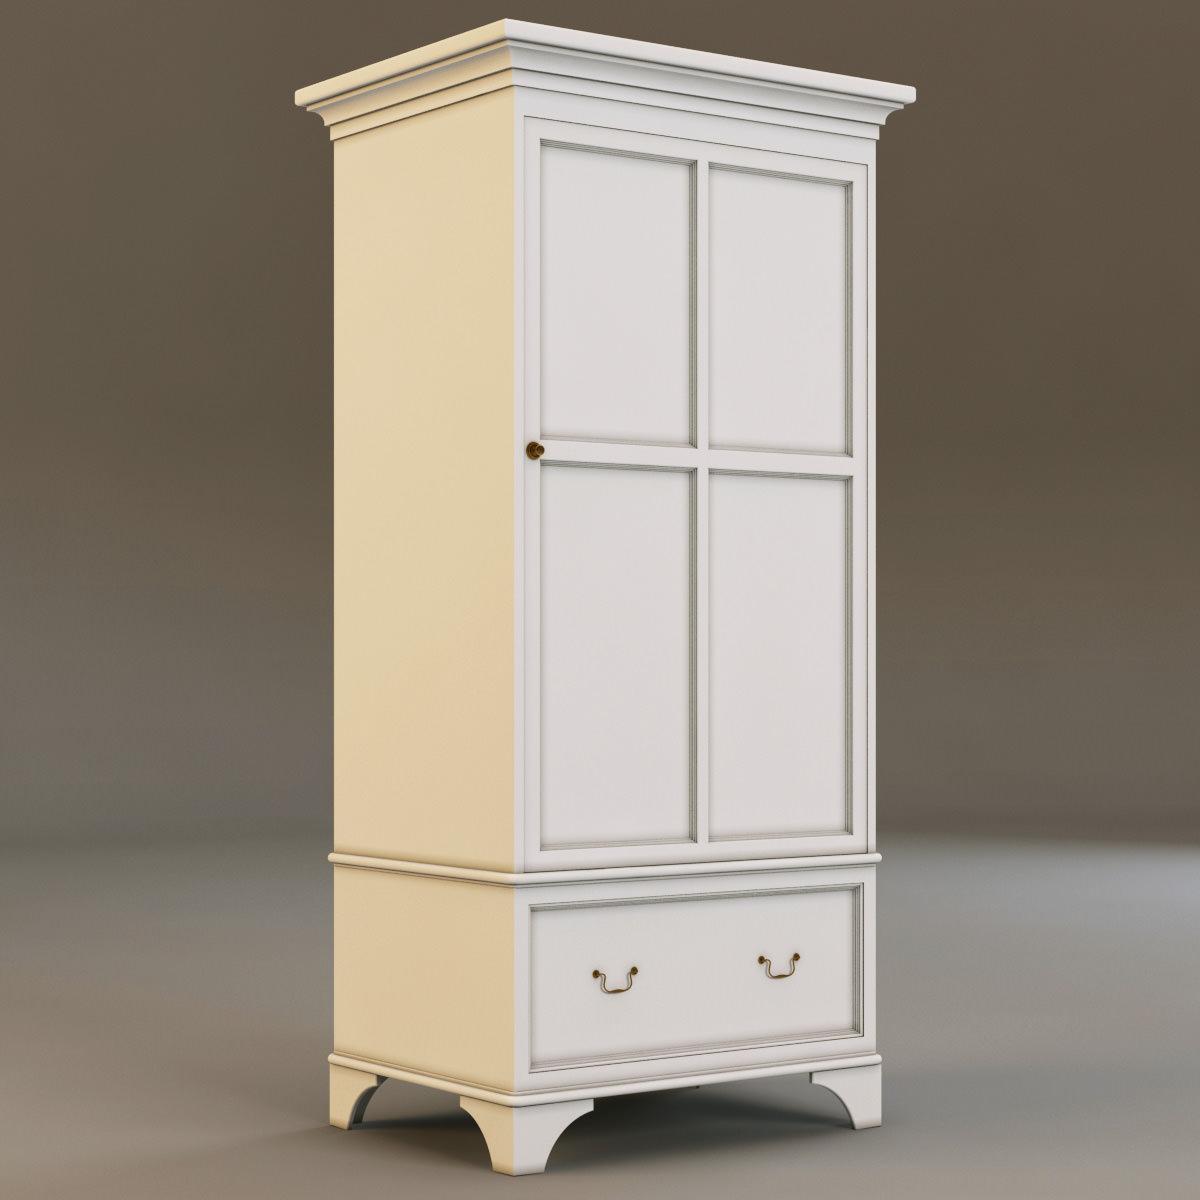 laura ashley cabinet 4 3d models